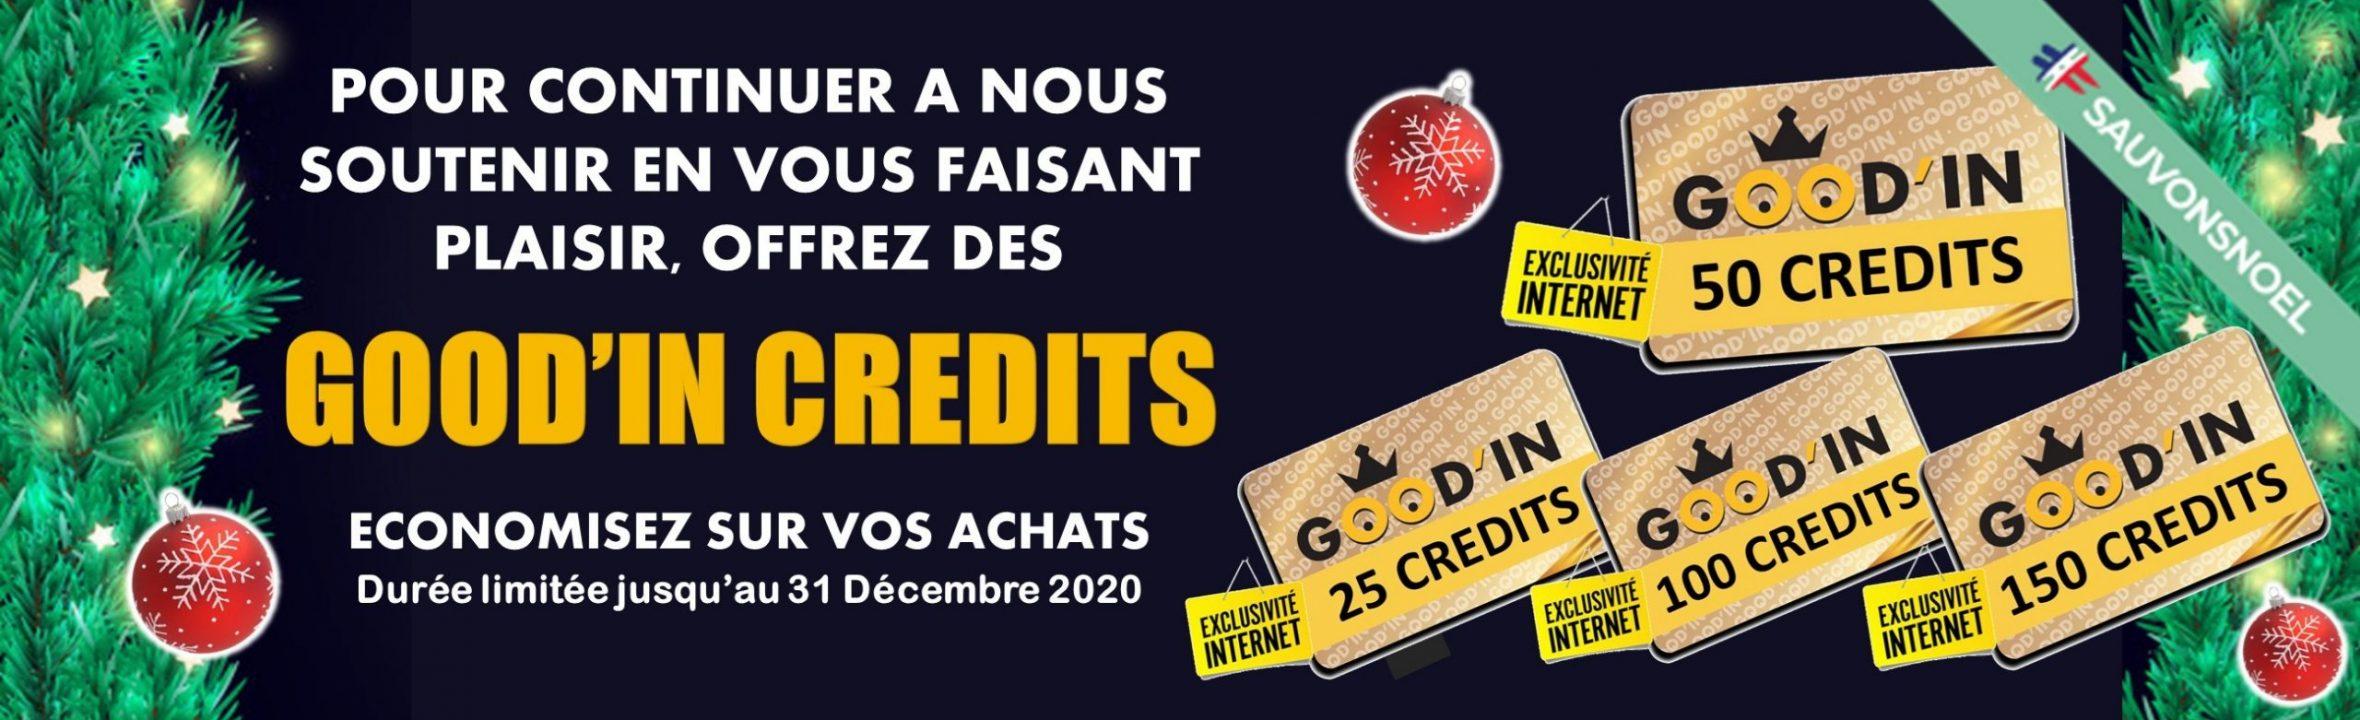 good'in crédits noel 2020 goodin shop sauvonsnoël